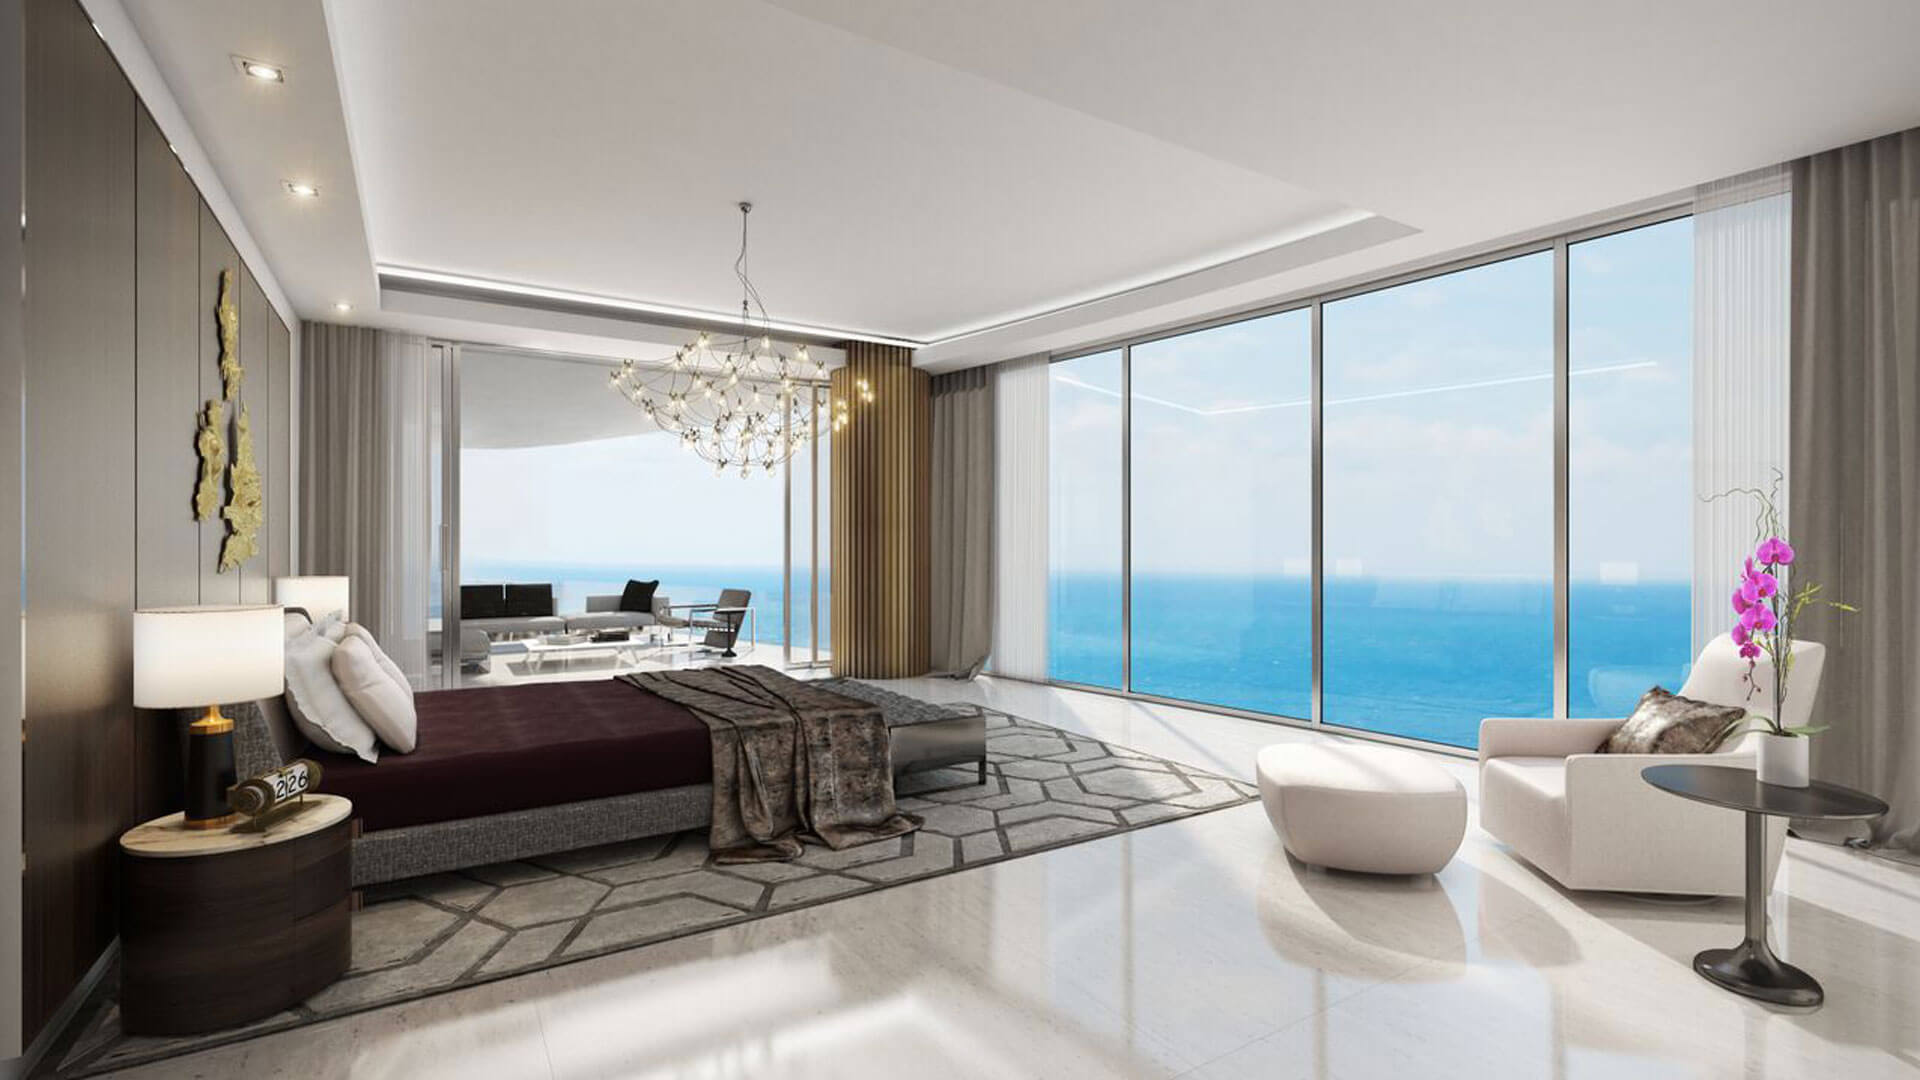 Estates-at-Acqualina-Miami-Bedroom.jpg